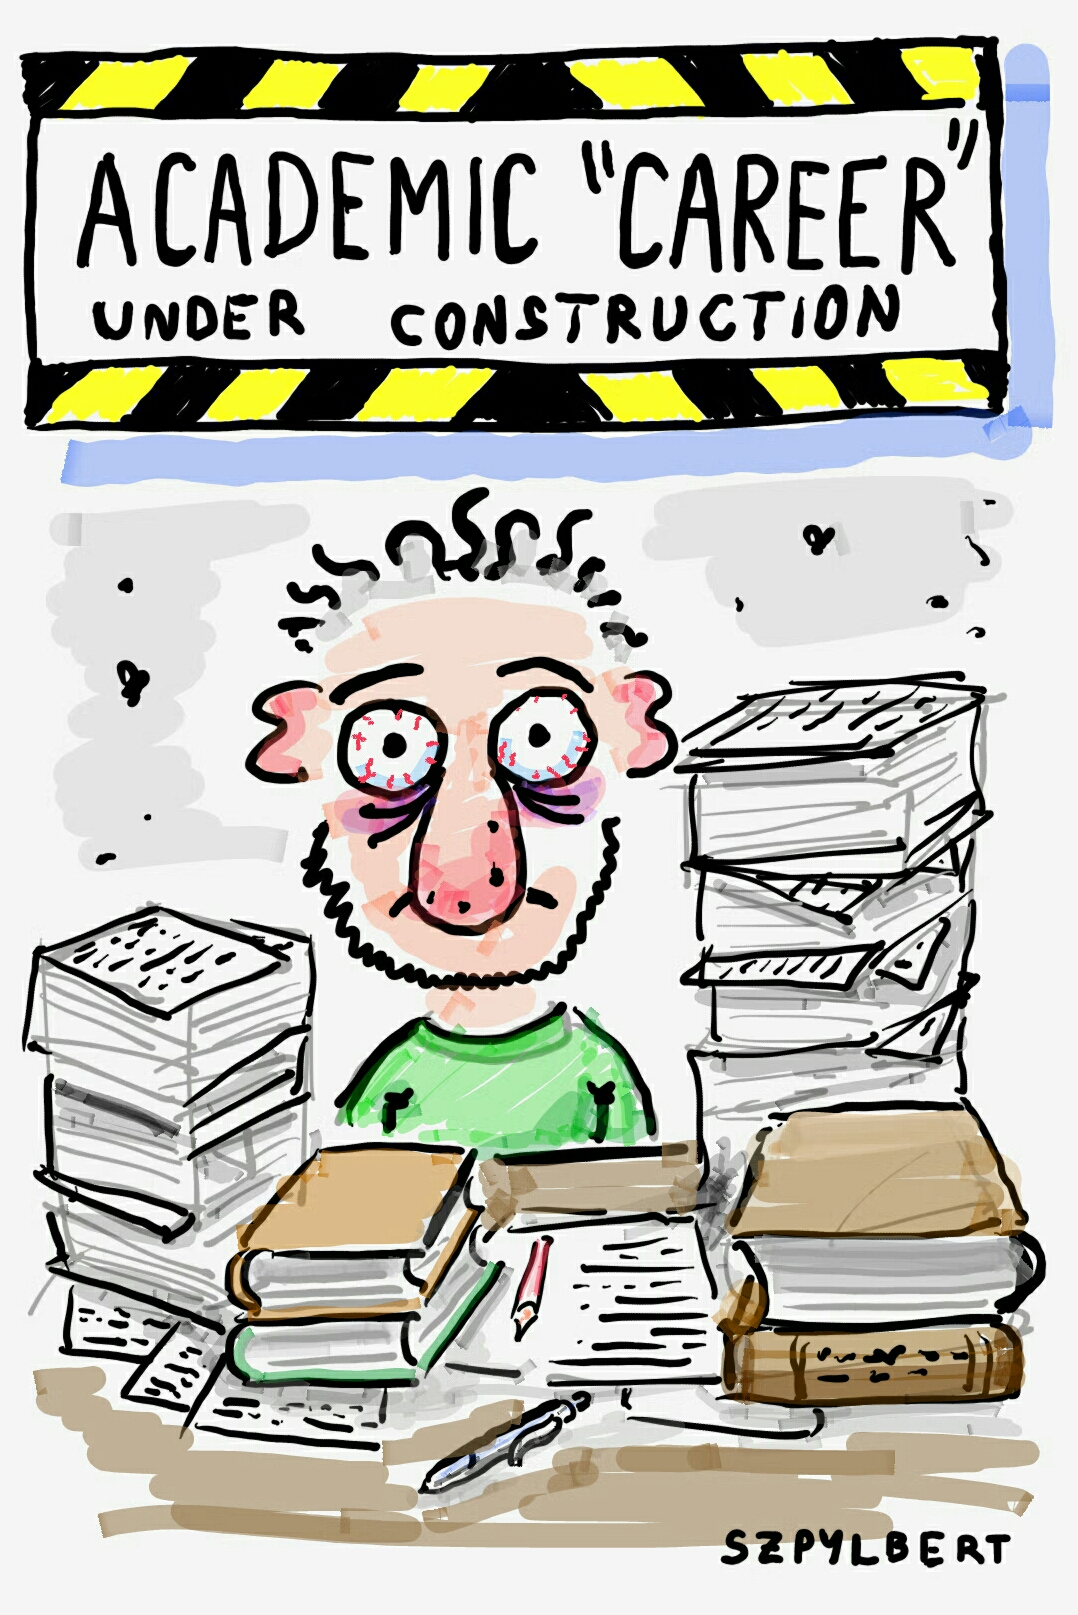 Academic Career Szpylbert S Cartoon Blog